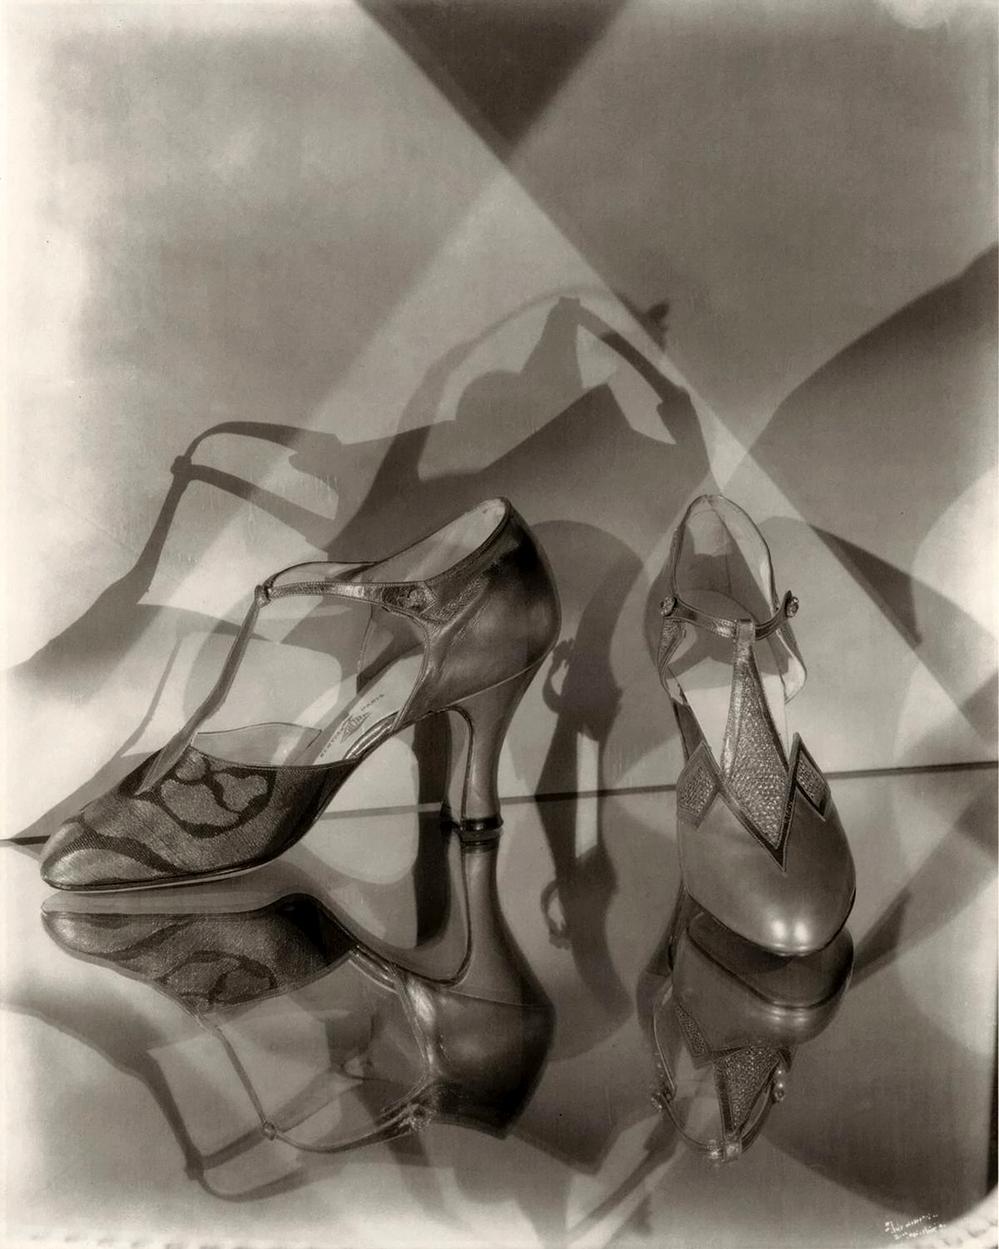 Edward Steichen shoe photography